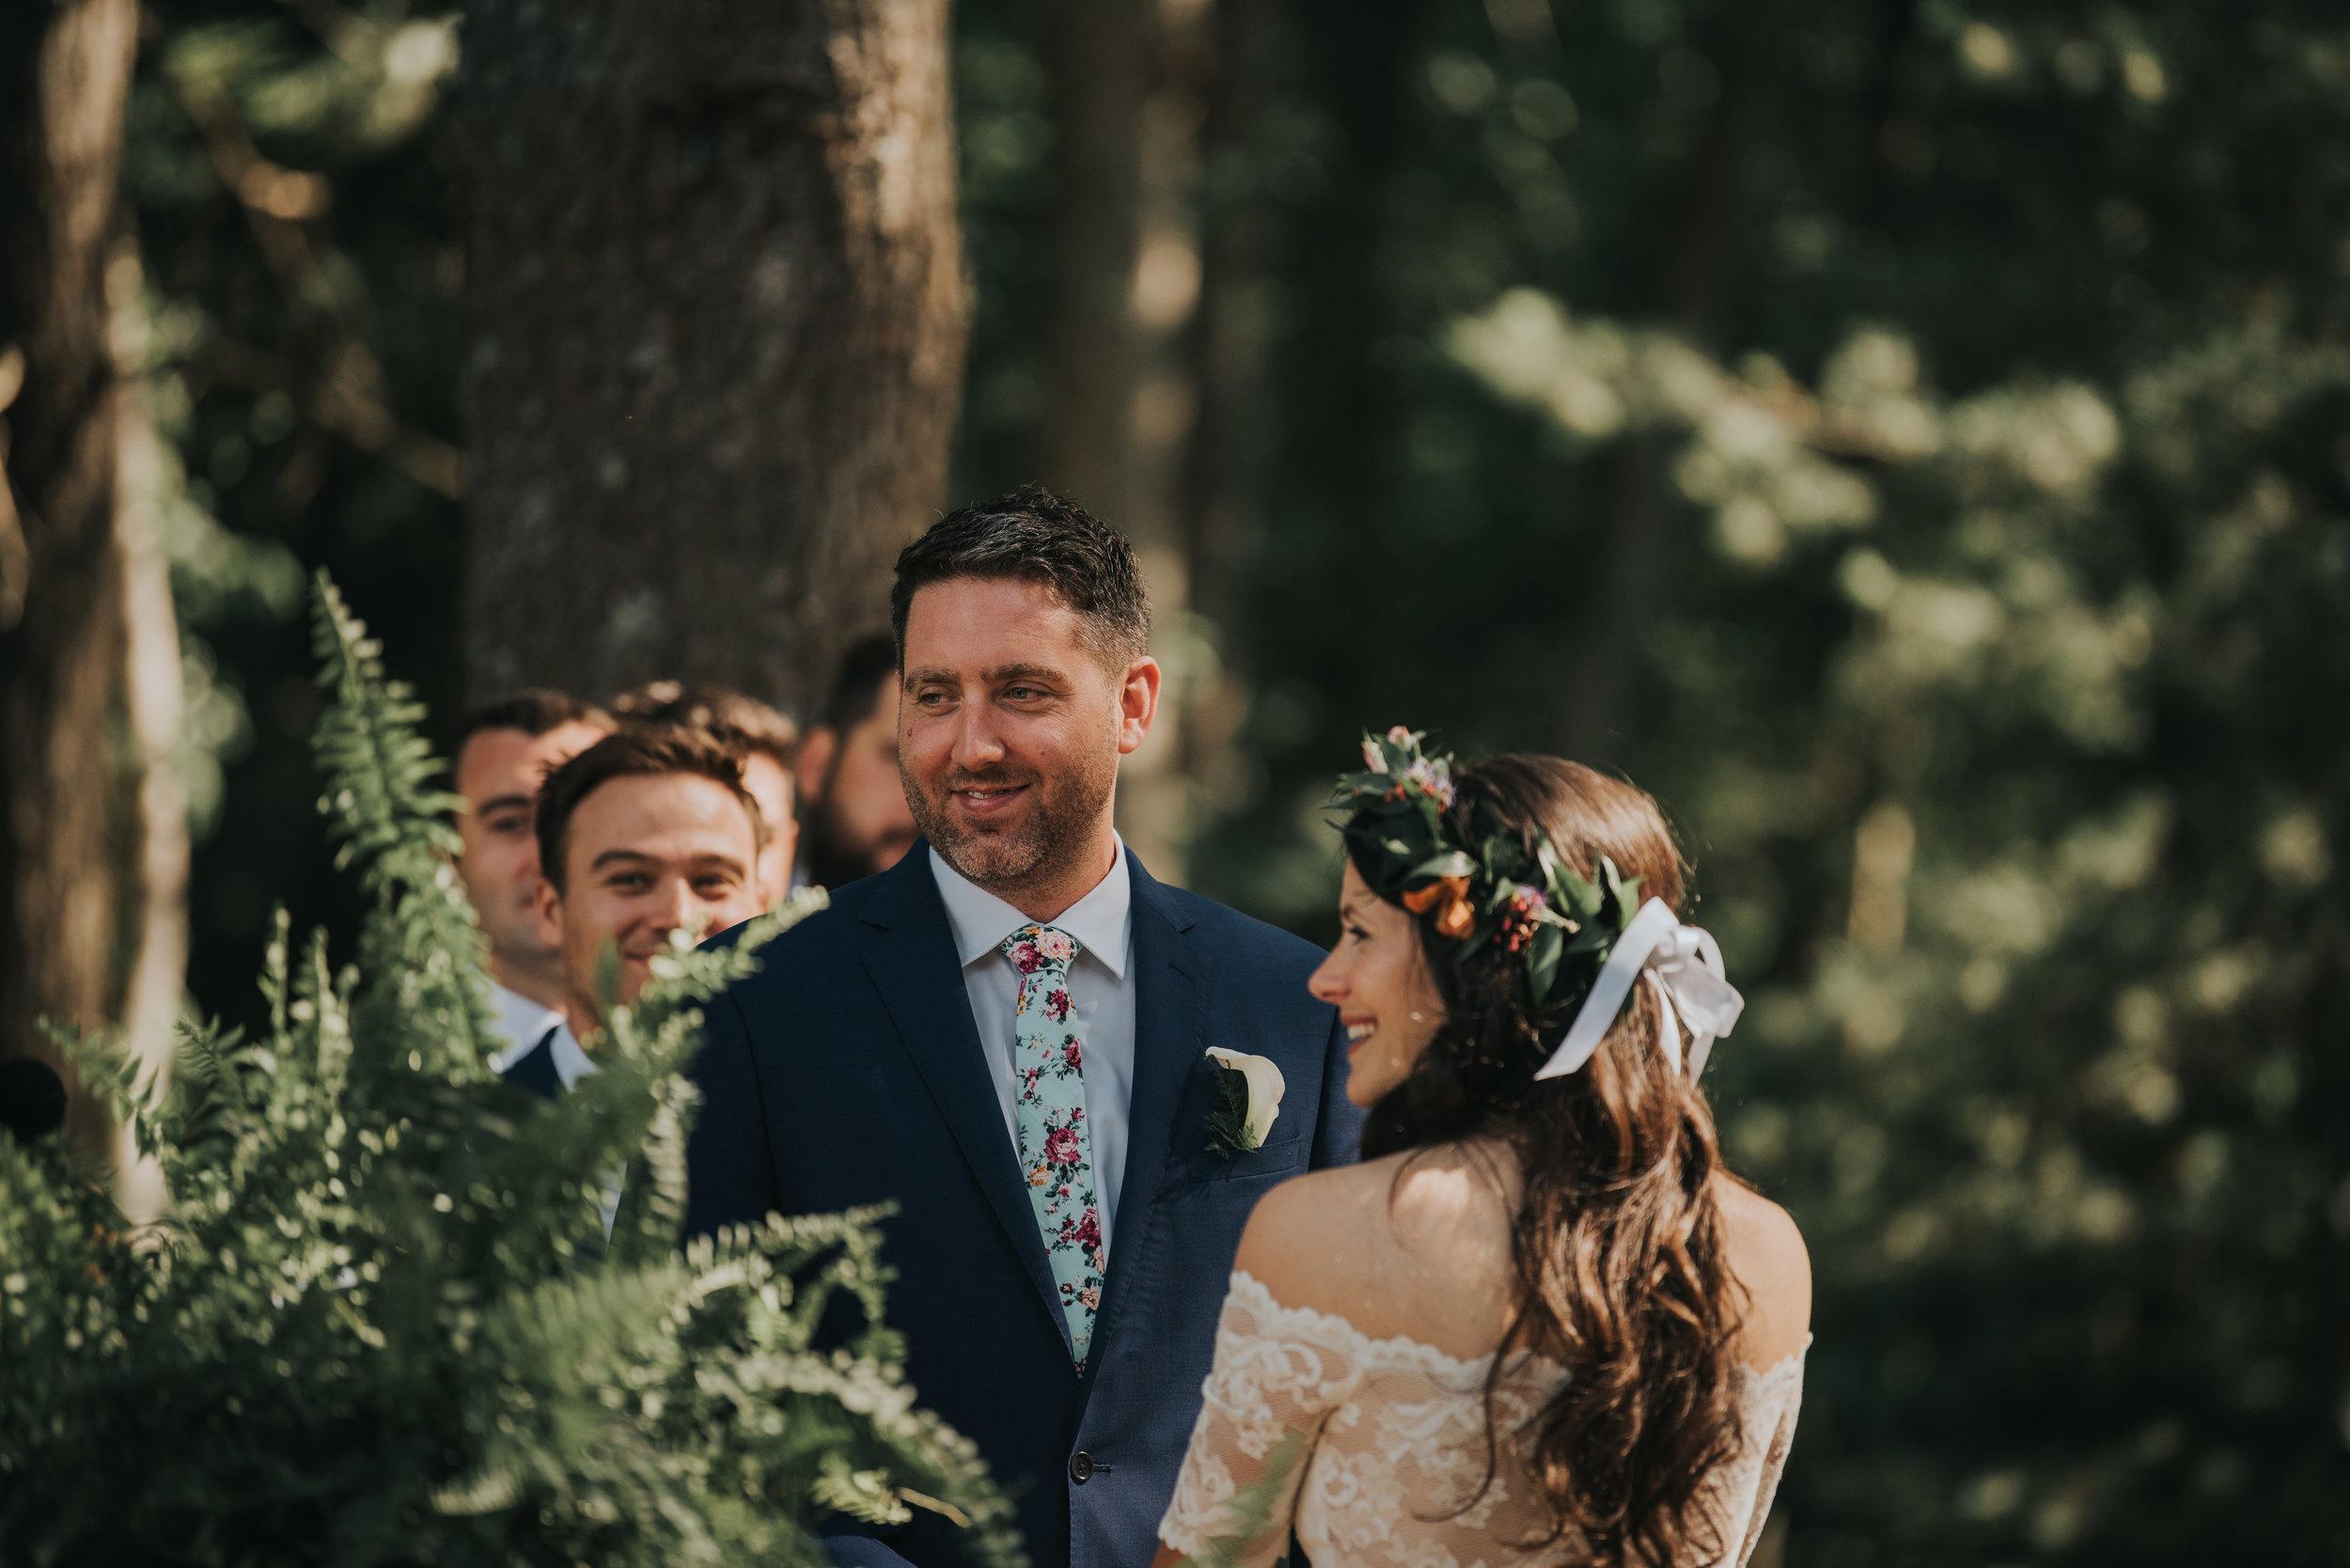 bride-and-groom-vows-toronto-bohemian-boho-outdoor-summer-wedding-documentary-wedding-photography-by-willow-birch-photo.jpg